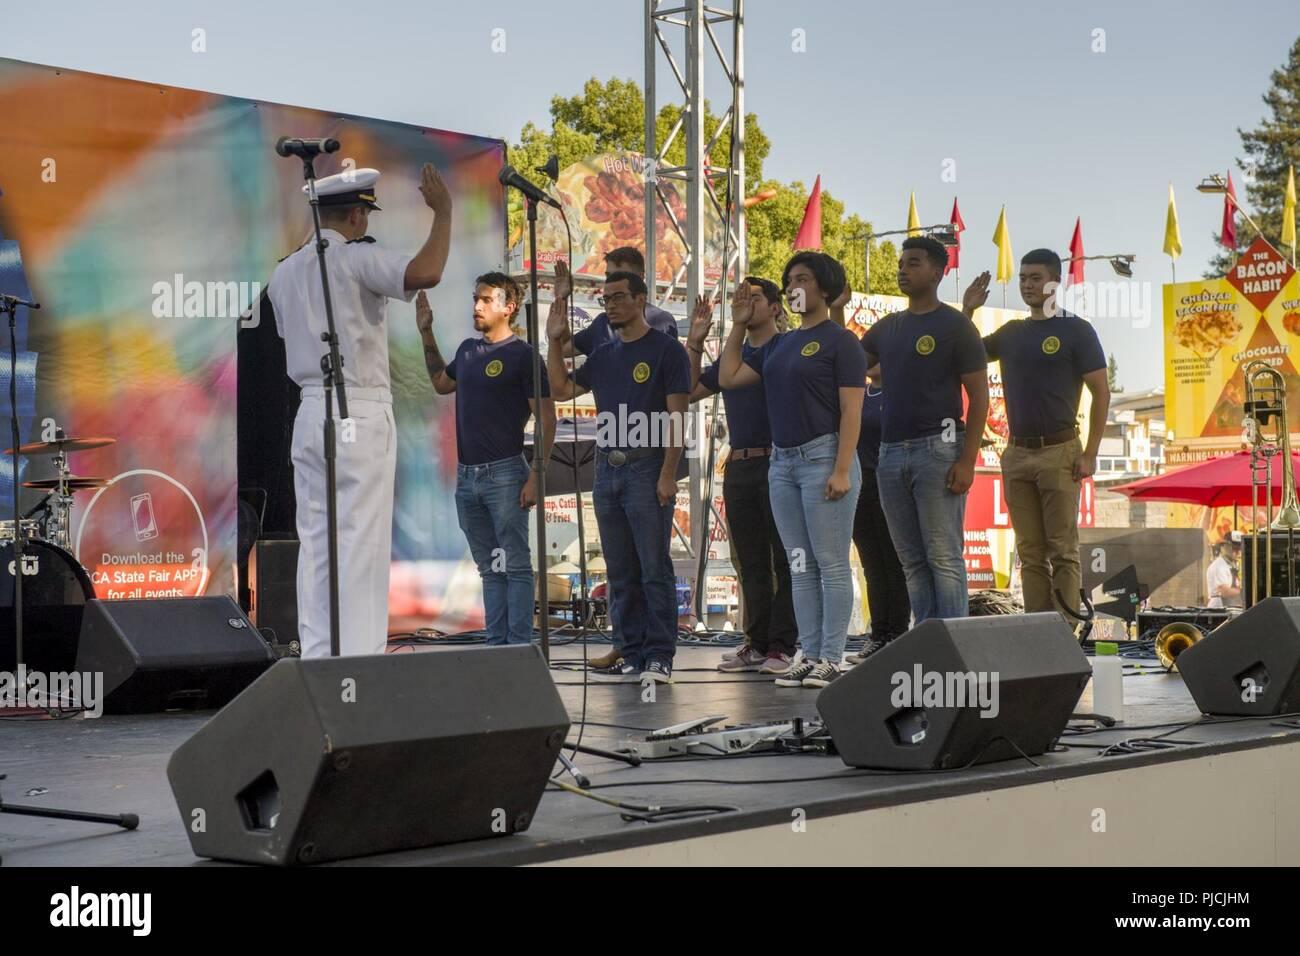 SACRAMENTO Calif , (July 19, 2018) Nine future Sailors